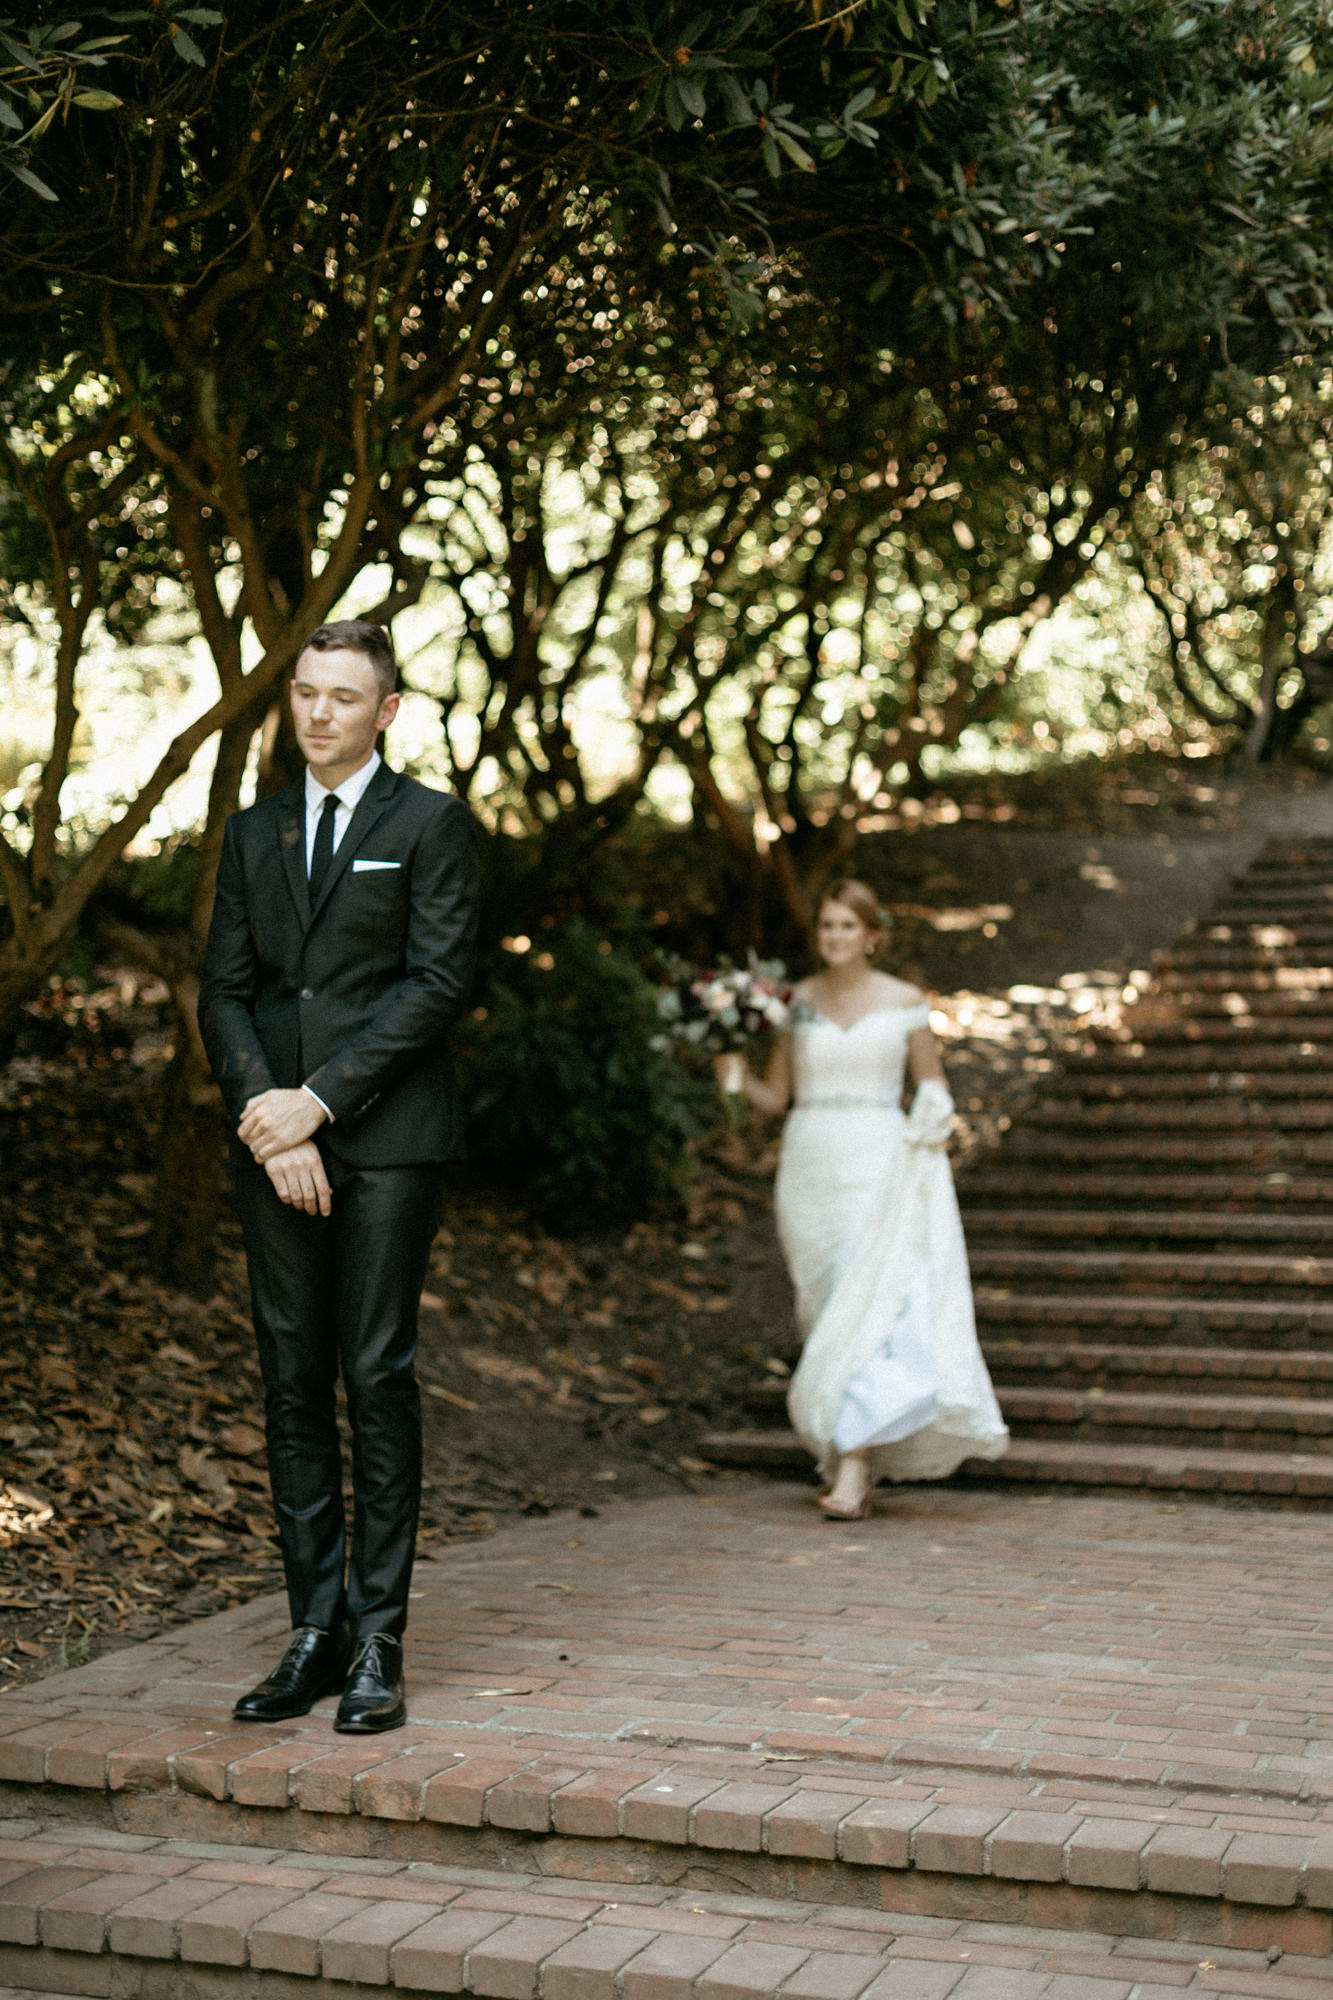 the_evergreen_portland_wedding-14.jpg